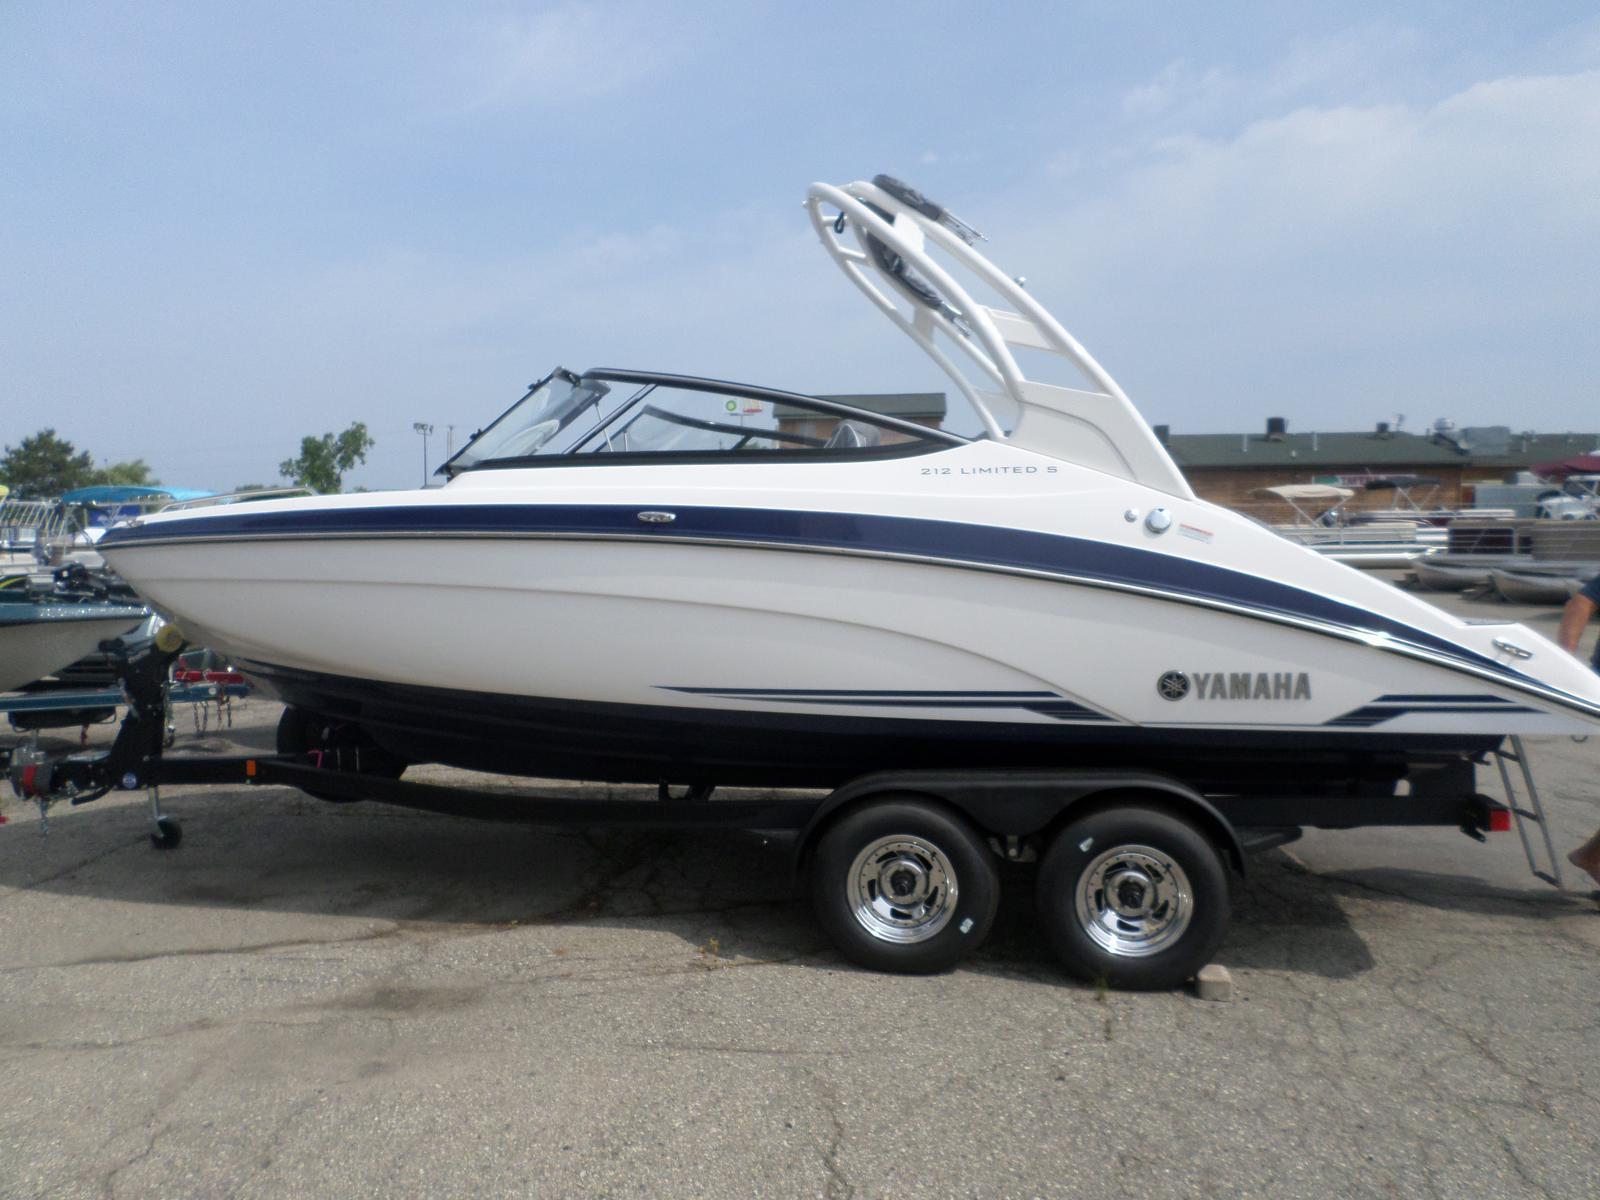 Yamaha jet boats 212 LIMITED S